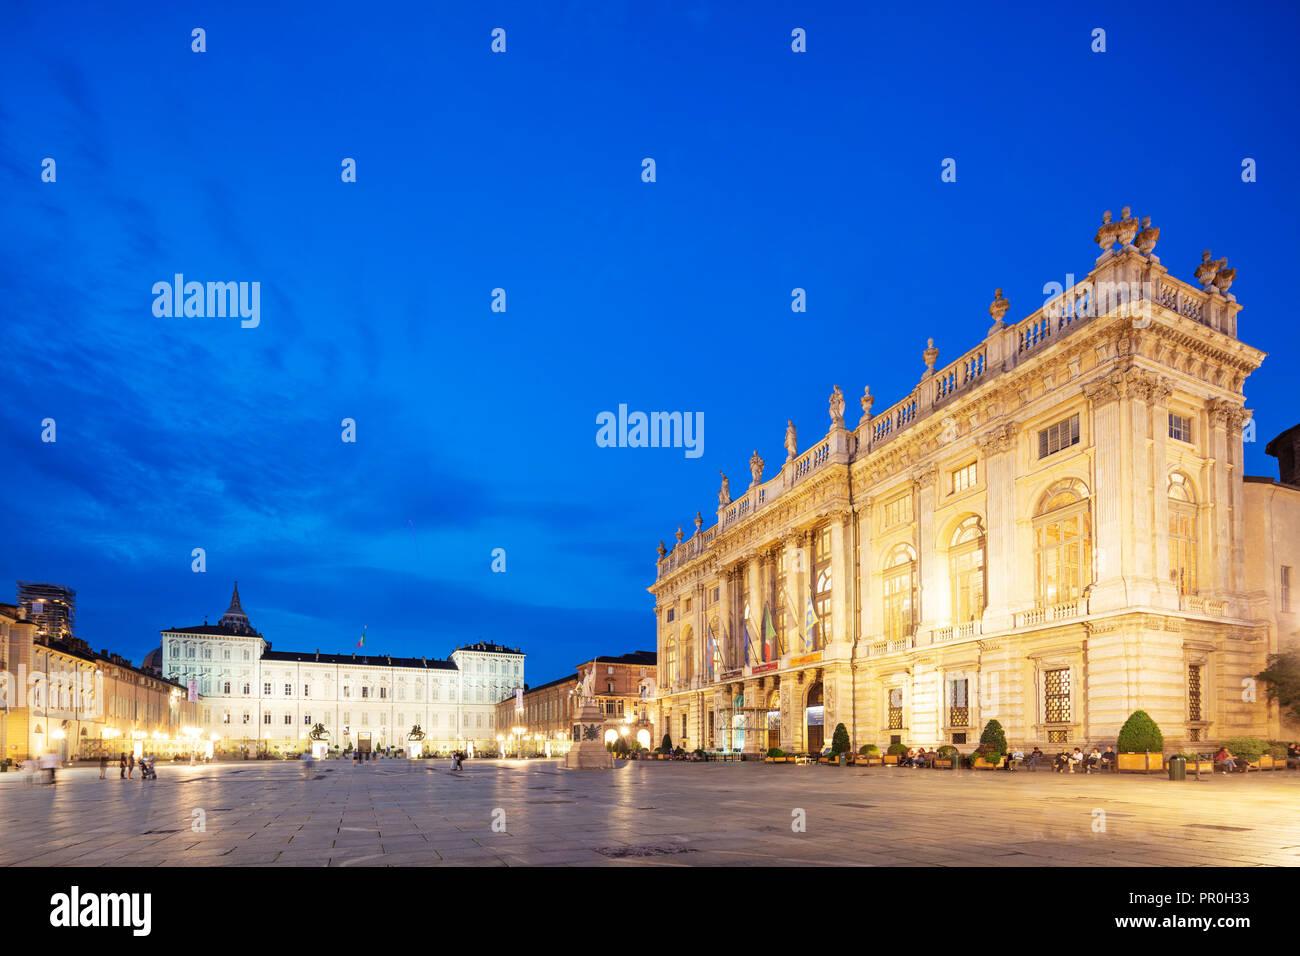 Palazzo Madama and Palazzo Reale, Turin, Piedmont, Italy, Europe - Stock Image